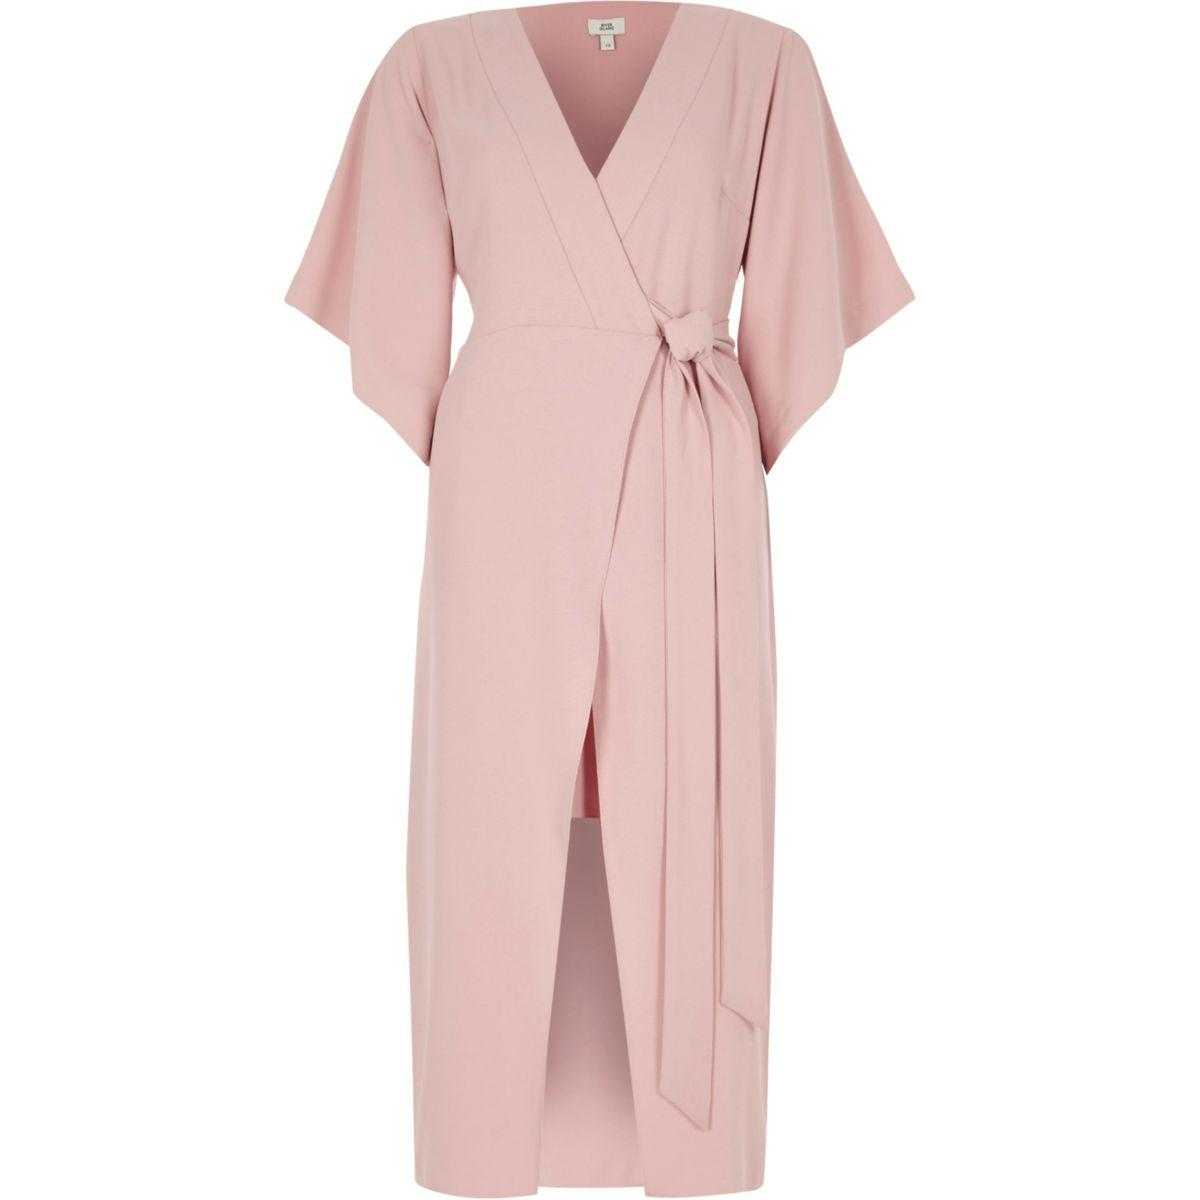 48a94e26c River Island Light Pink Wrap Front Kimono Midi Dress Light Pink Wrap ...